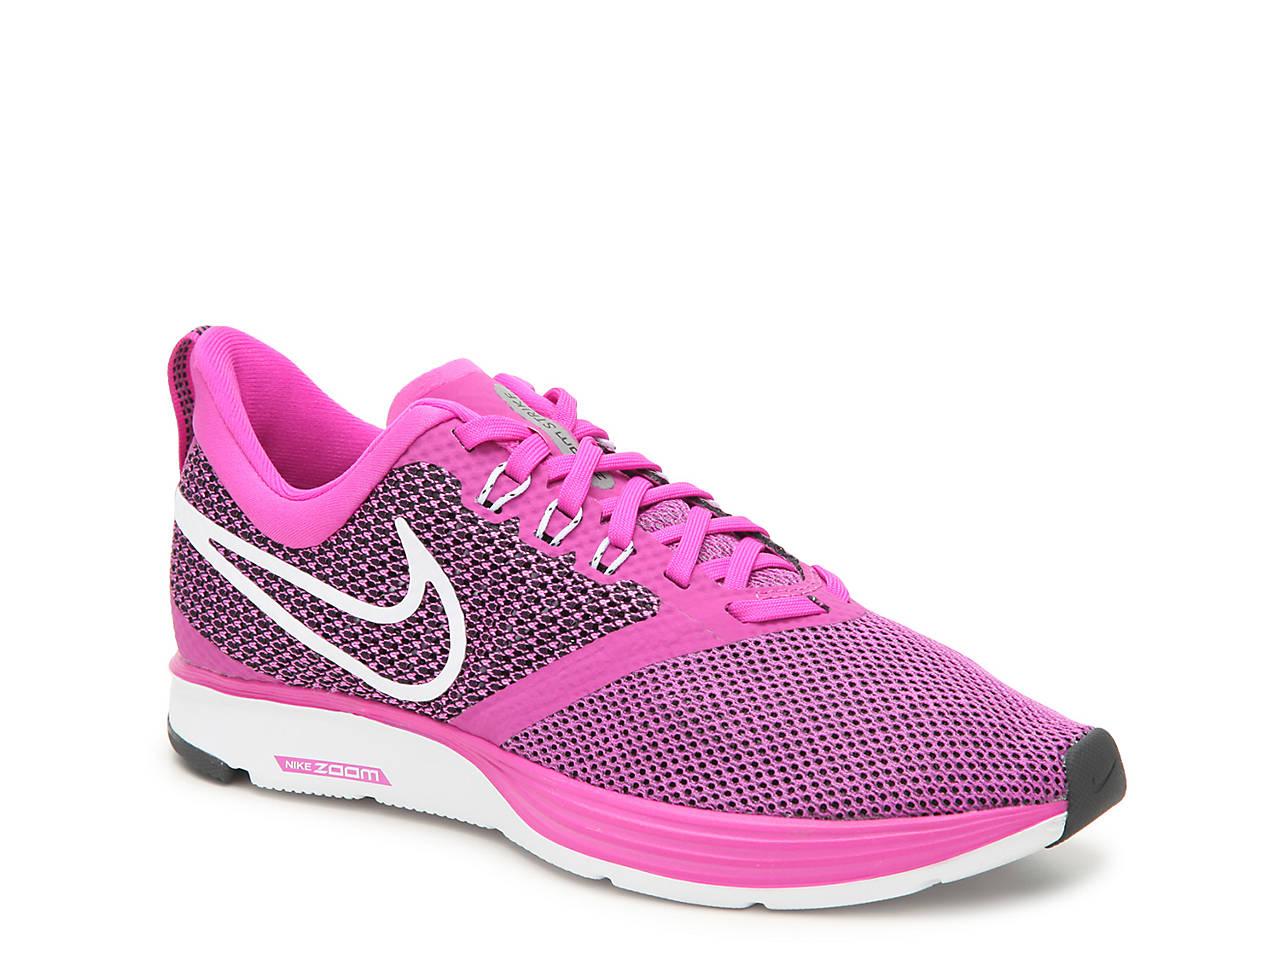 Nike Zoom Strike Lightweight Running Shoe - Women s Women s Shoes  ec6c6f767